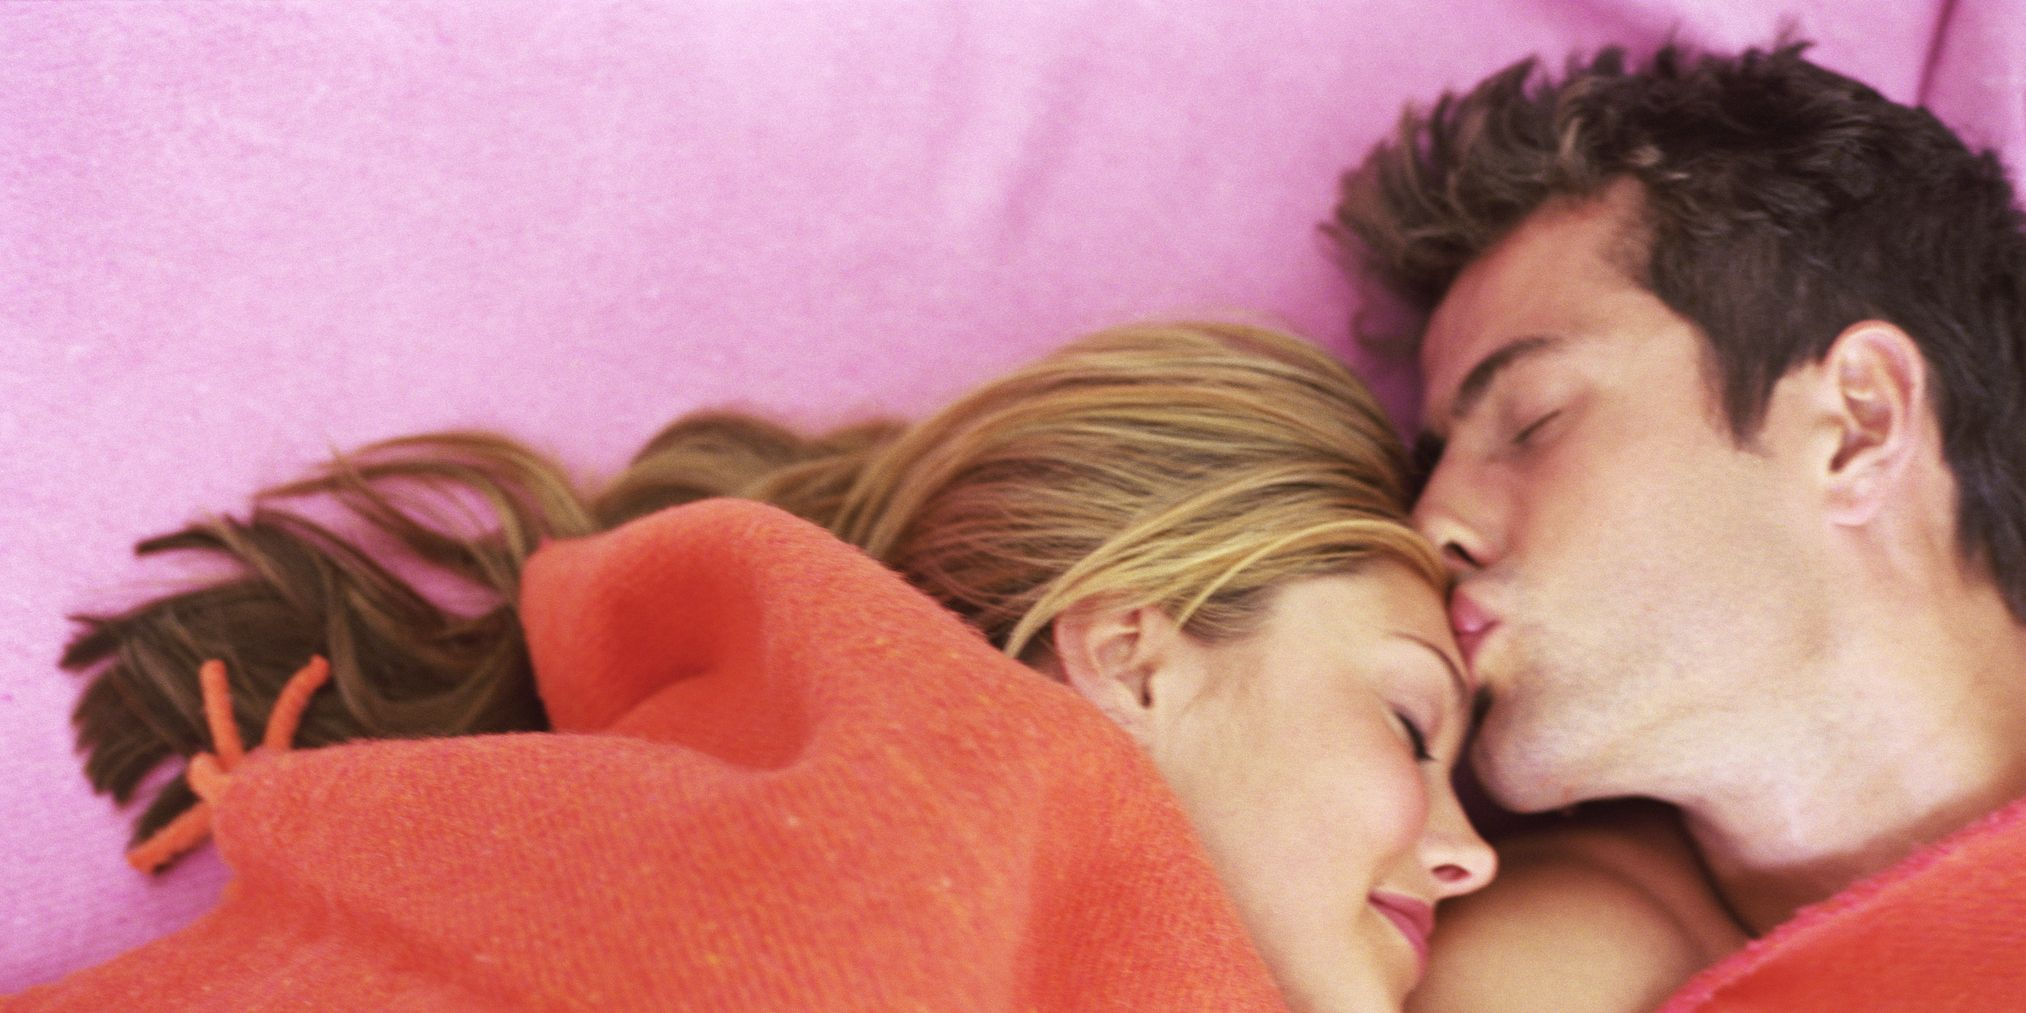 Man kissing resting woman on forehead